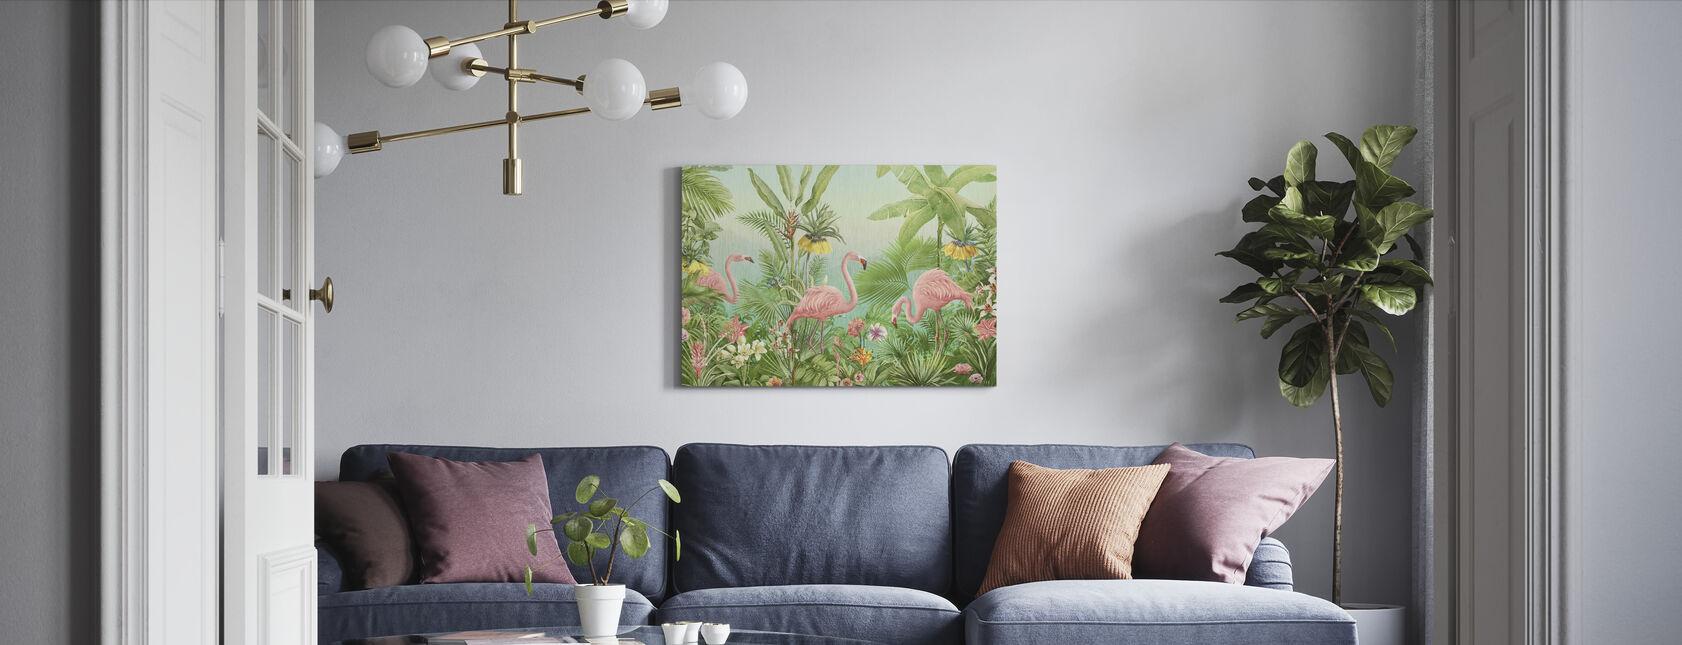 Flamingo Eden - Canvas print - Living Room